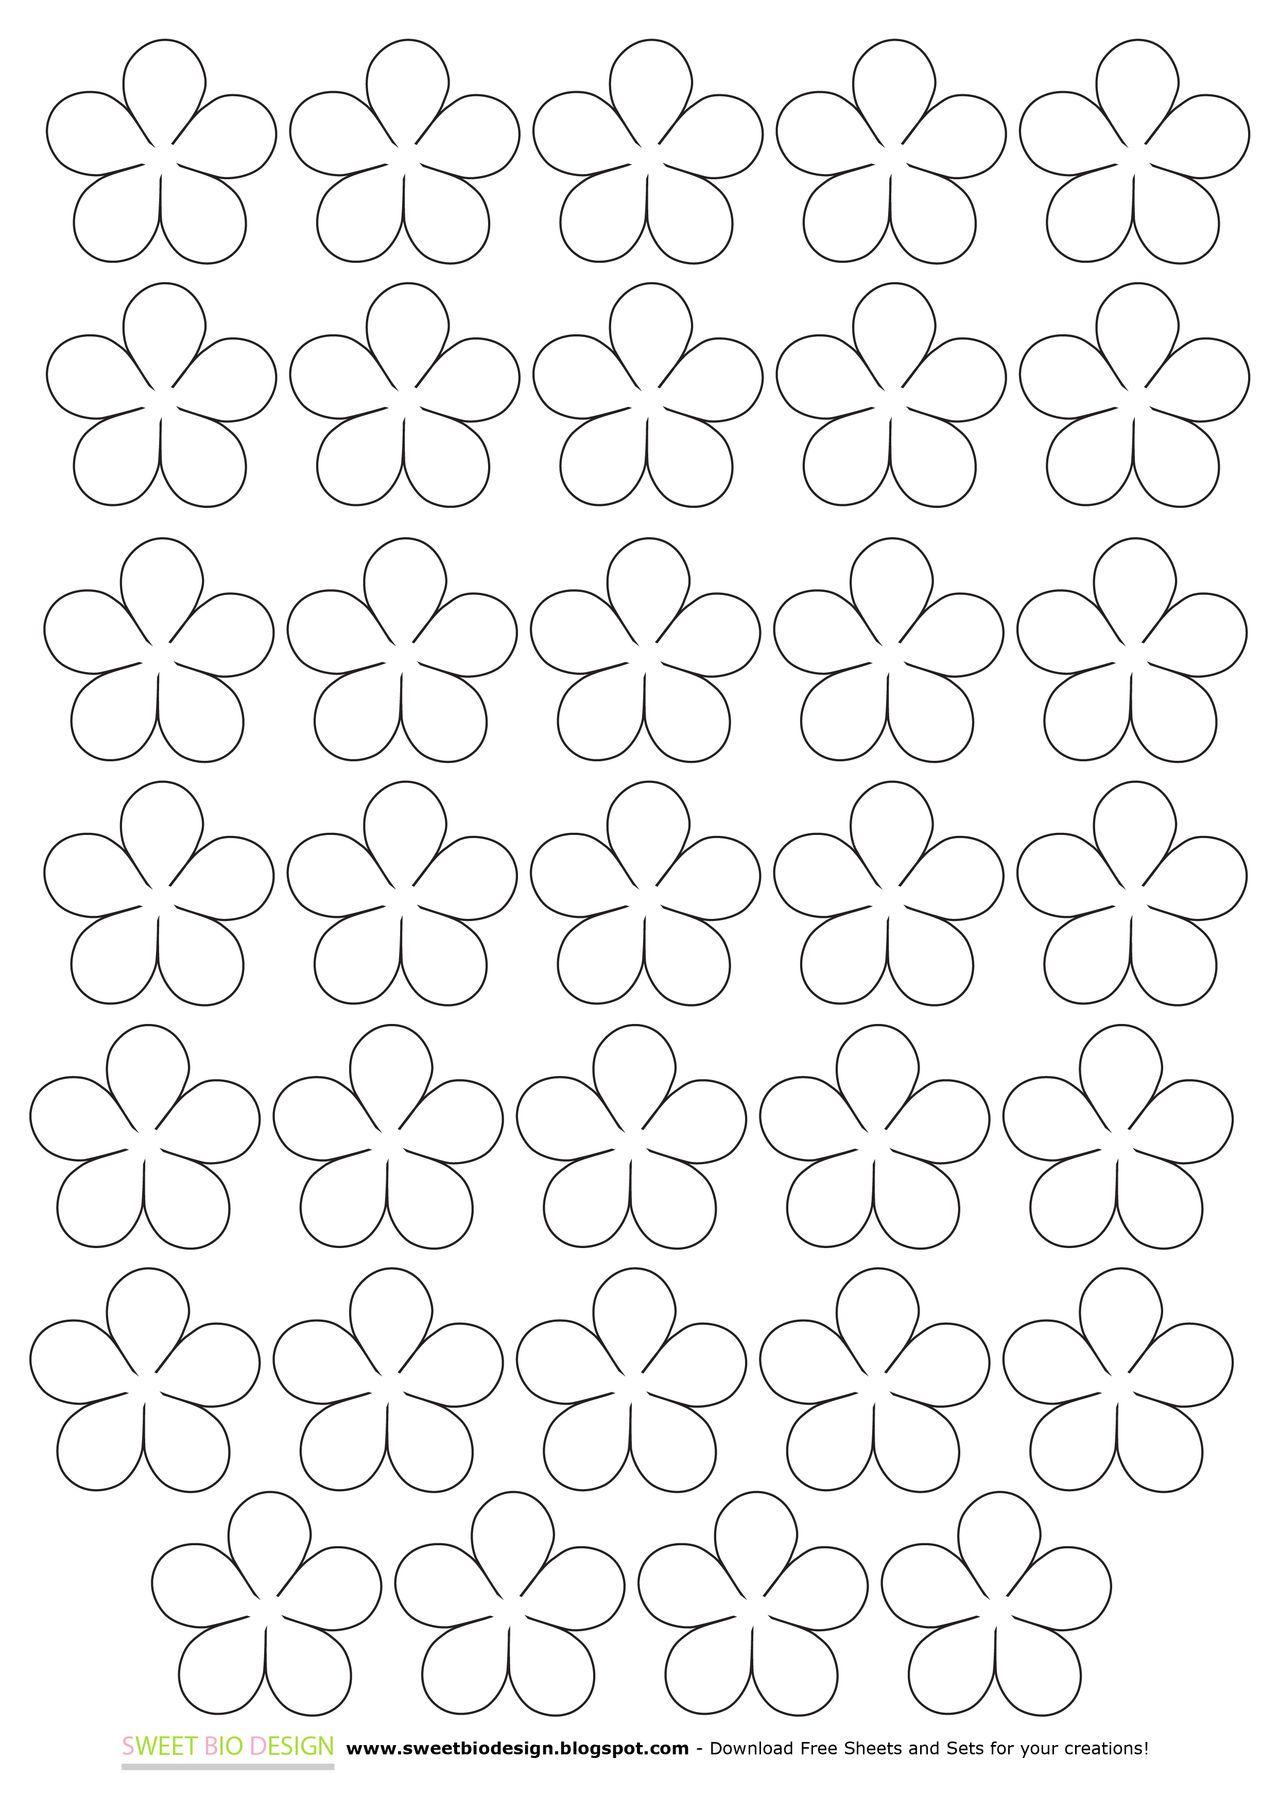 Vaso Di Fiori Di Carta Home Decor Paper Flowers Vase Diy